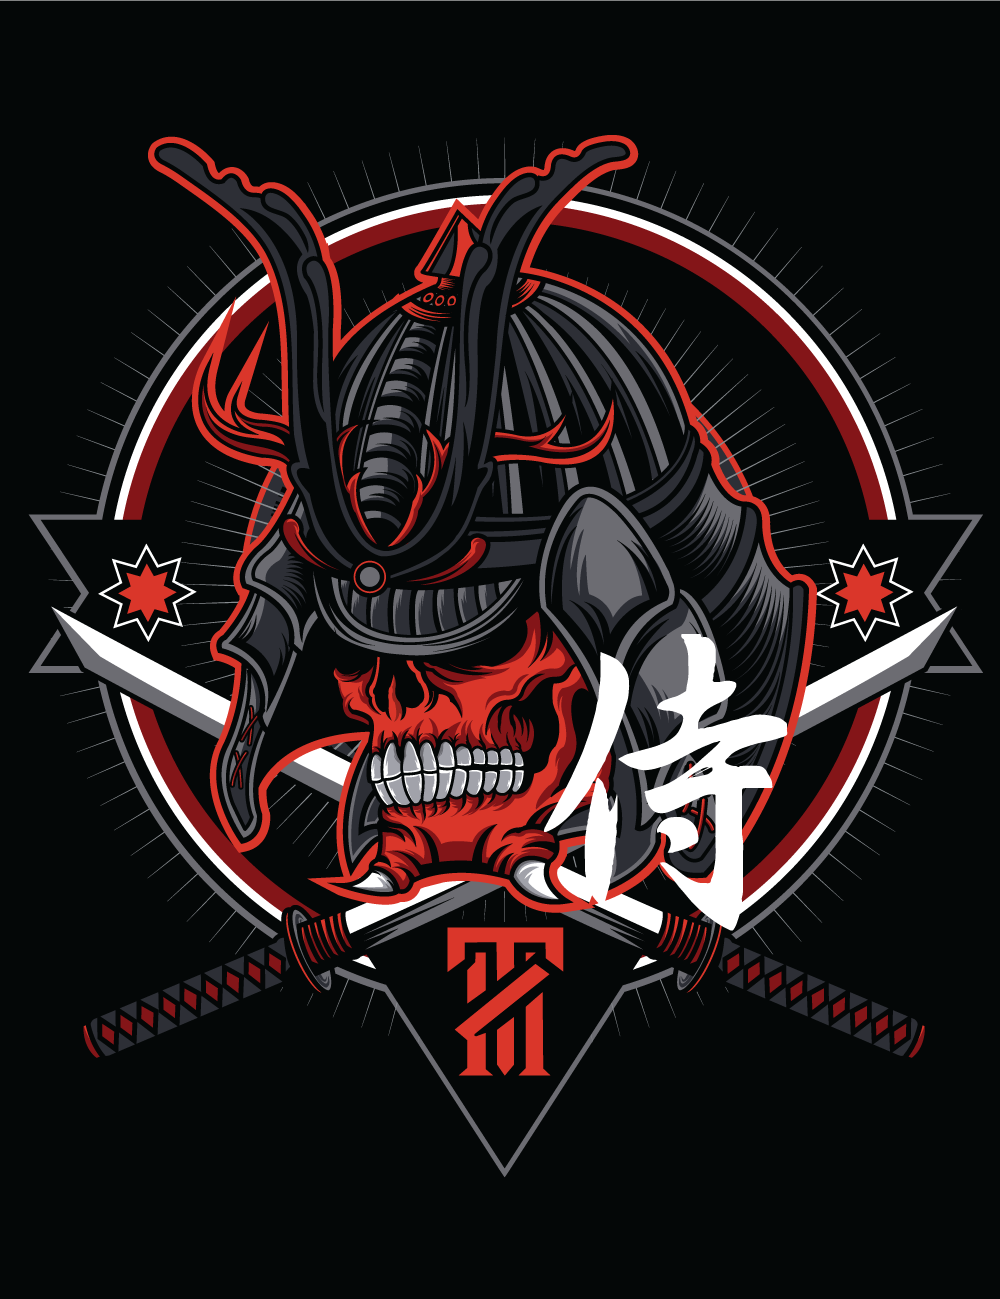 Simbol Huruf Keren Jepang Info Gtk